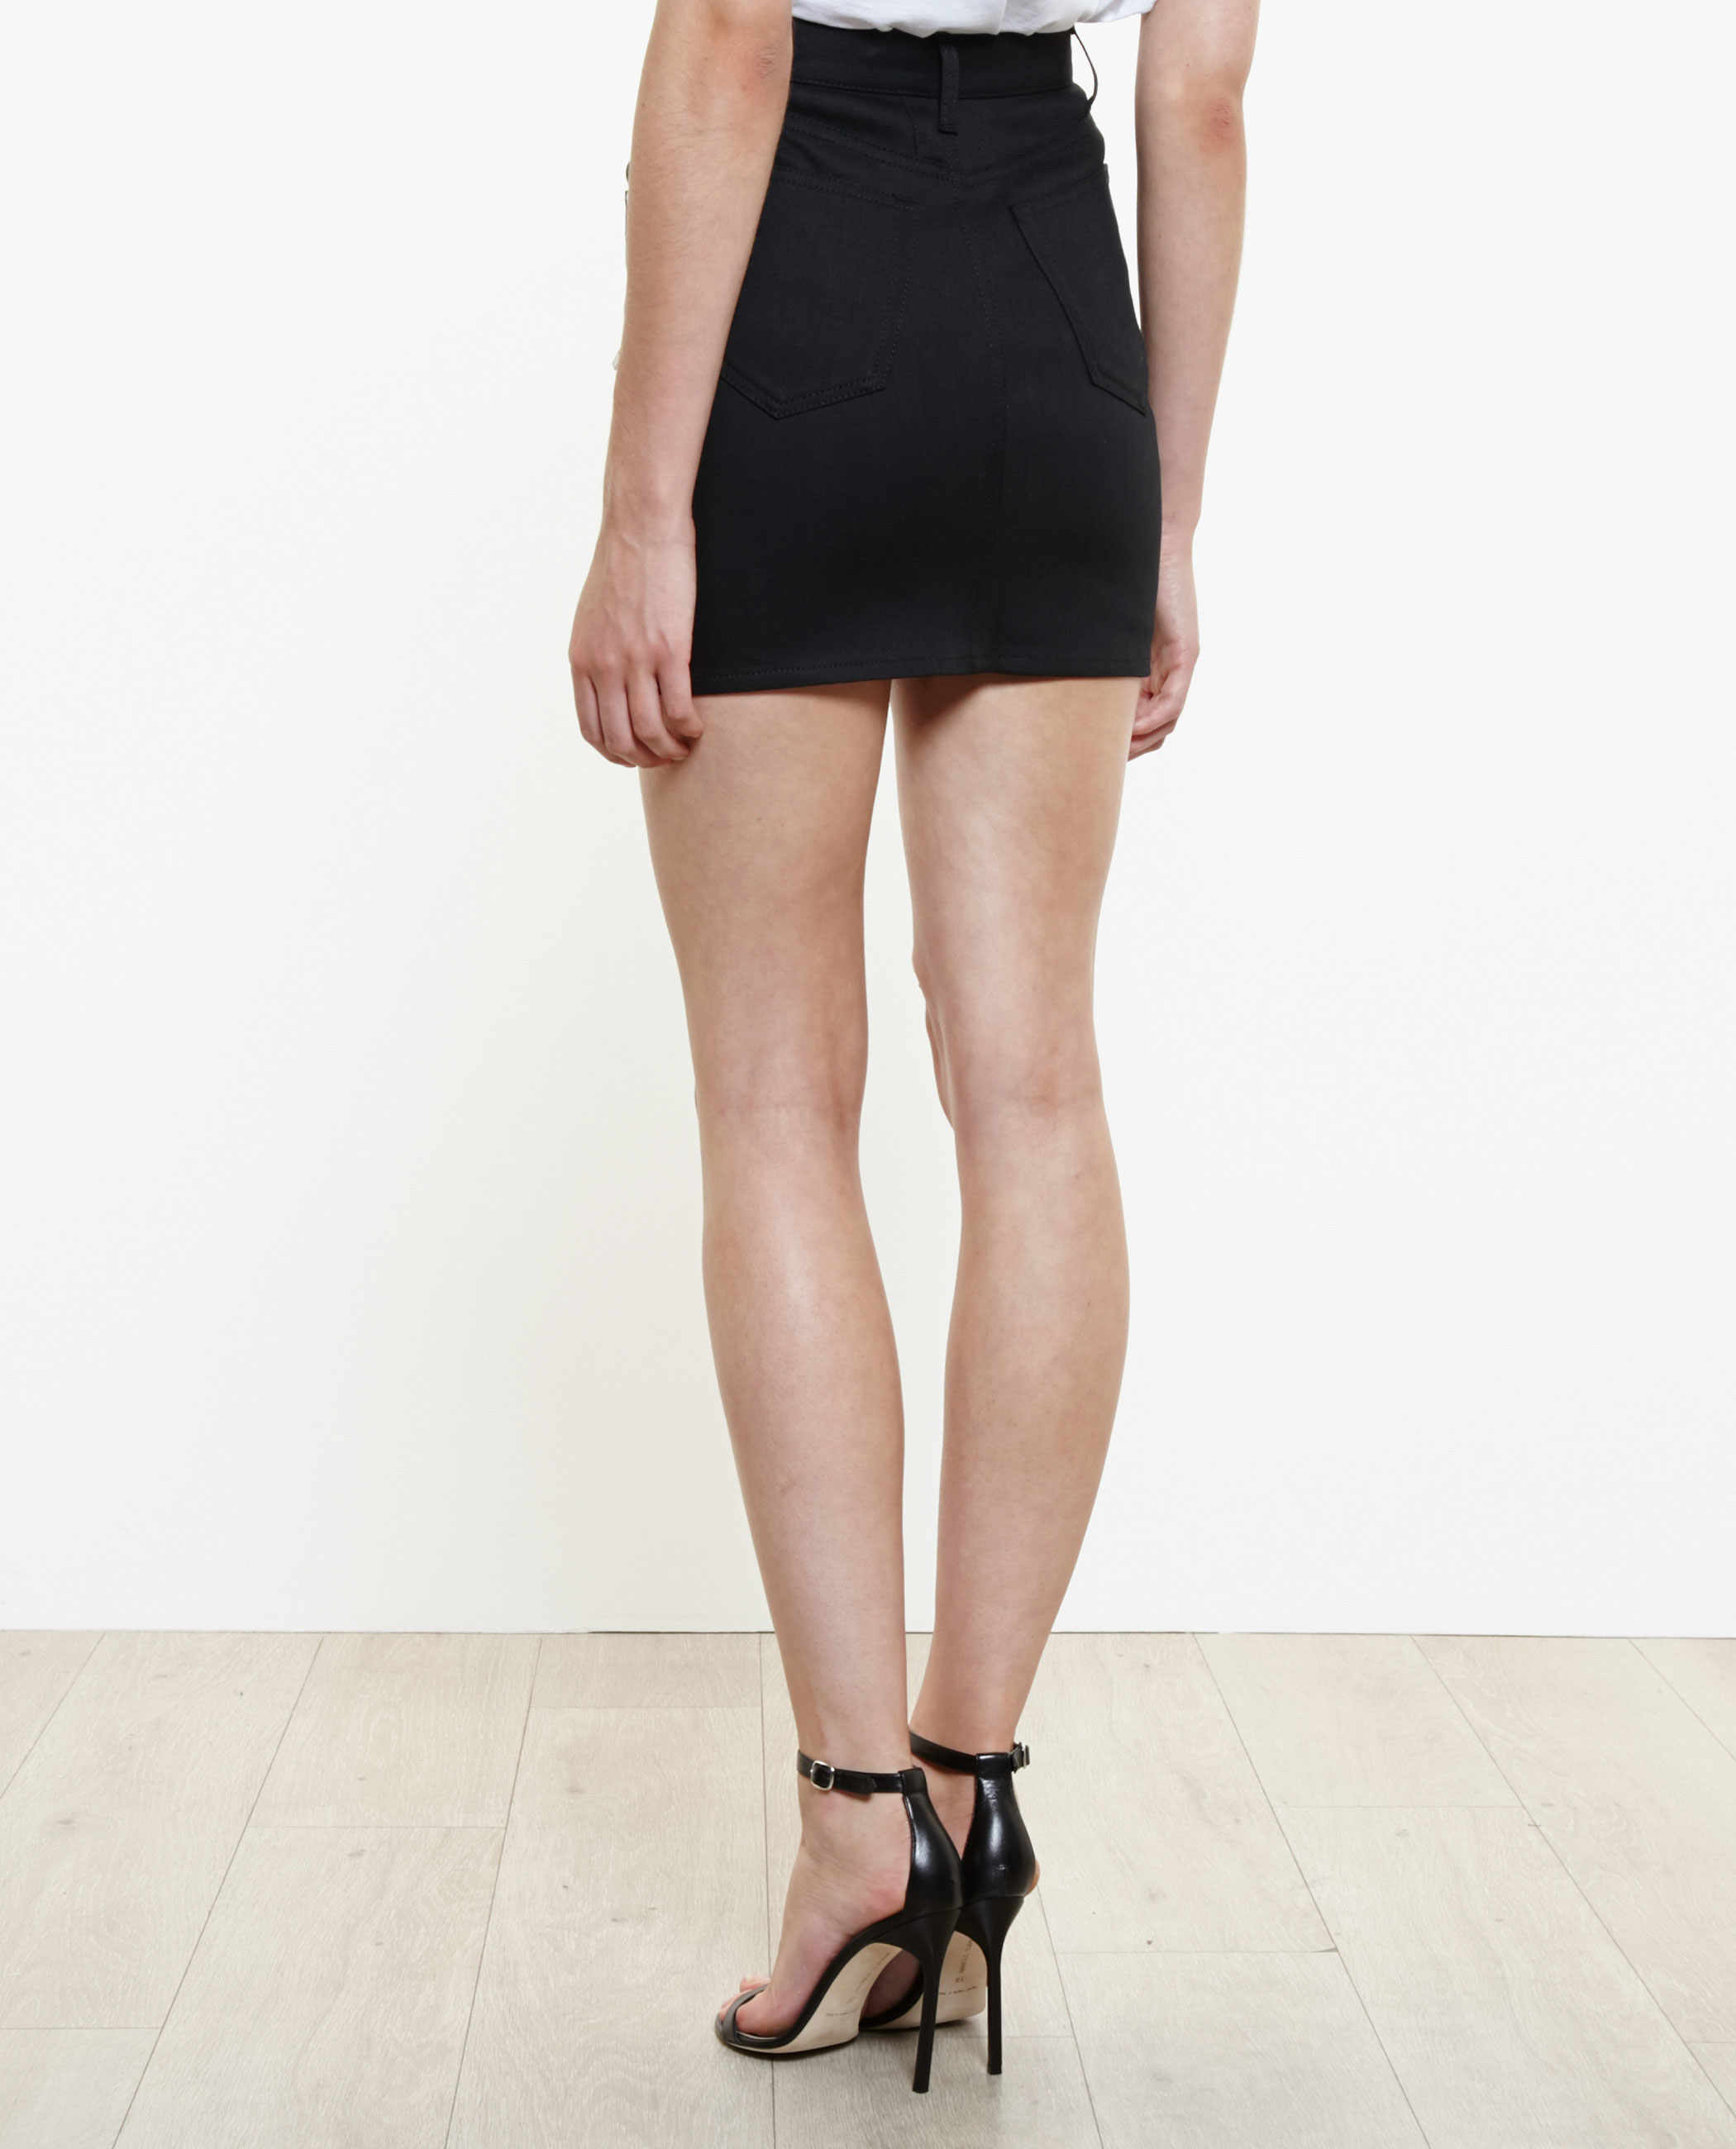 Shop Cheap Price denim mini skirt - Black Saint Laurent 2018 New Sale Online Free Shipping Low Price Real Quality Free Shipping Low Price SZ7RKACW